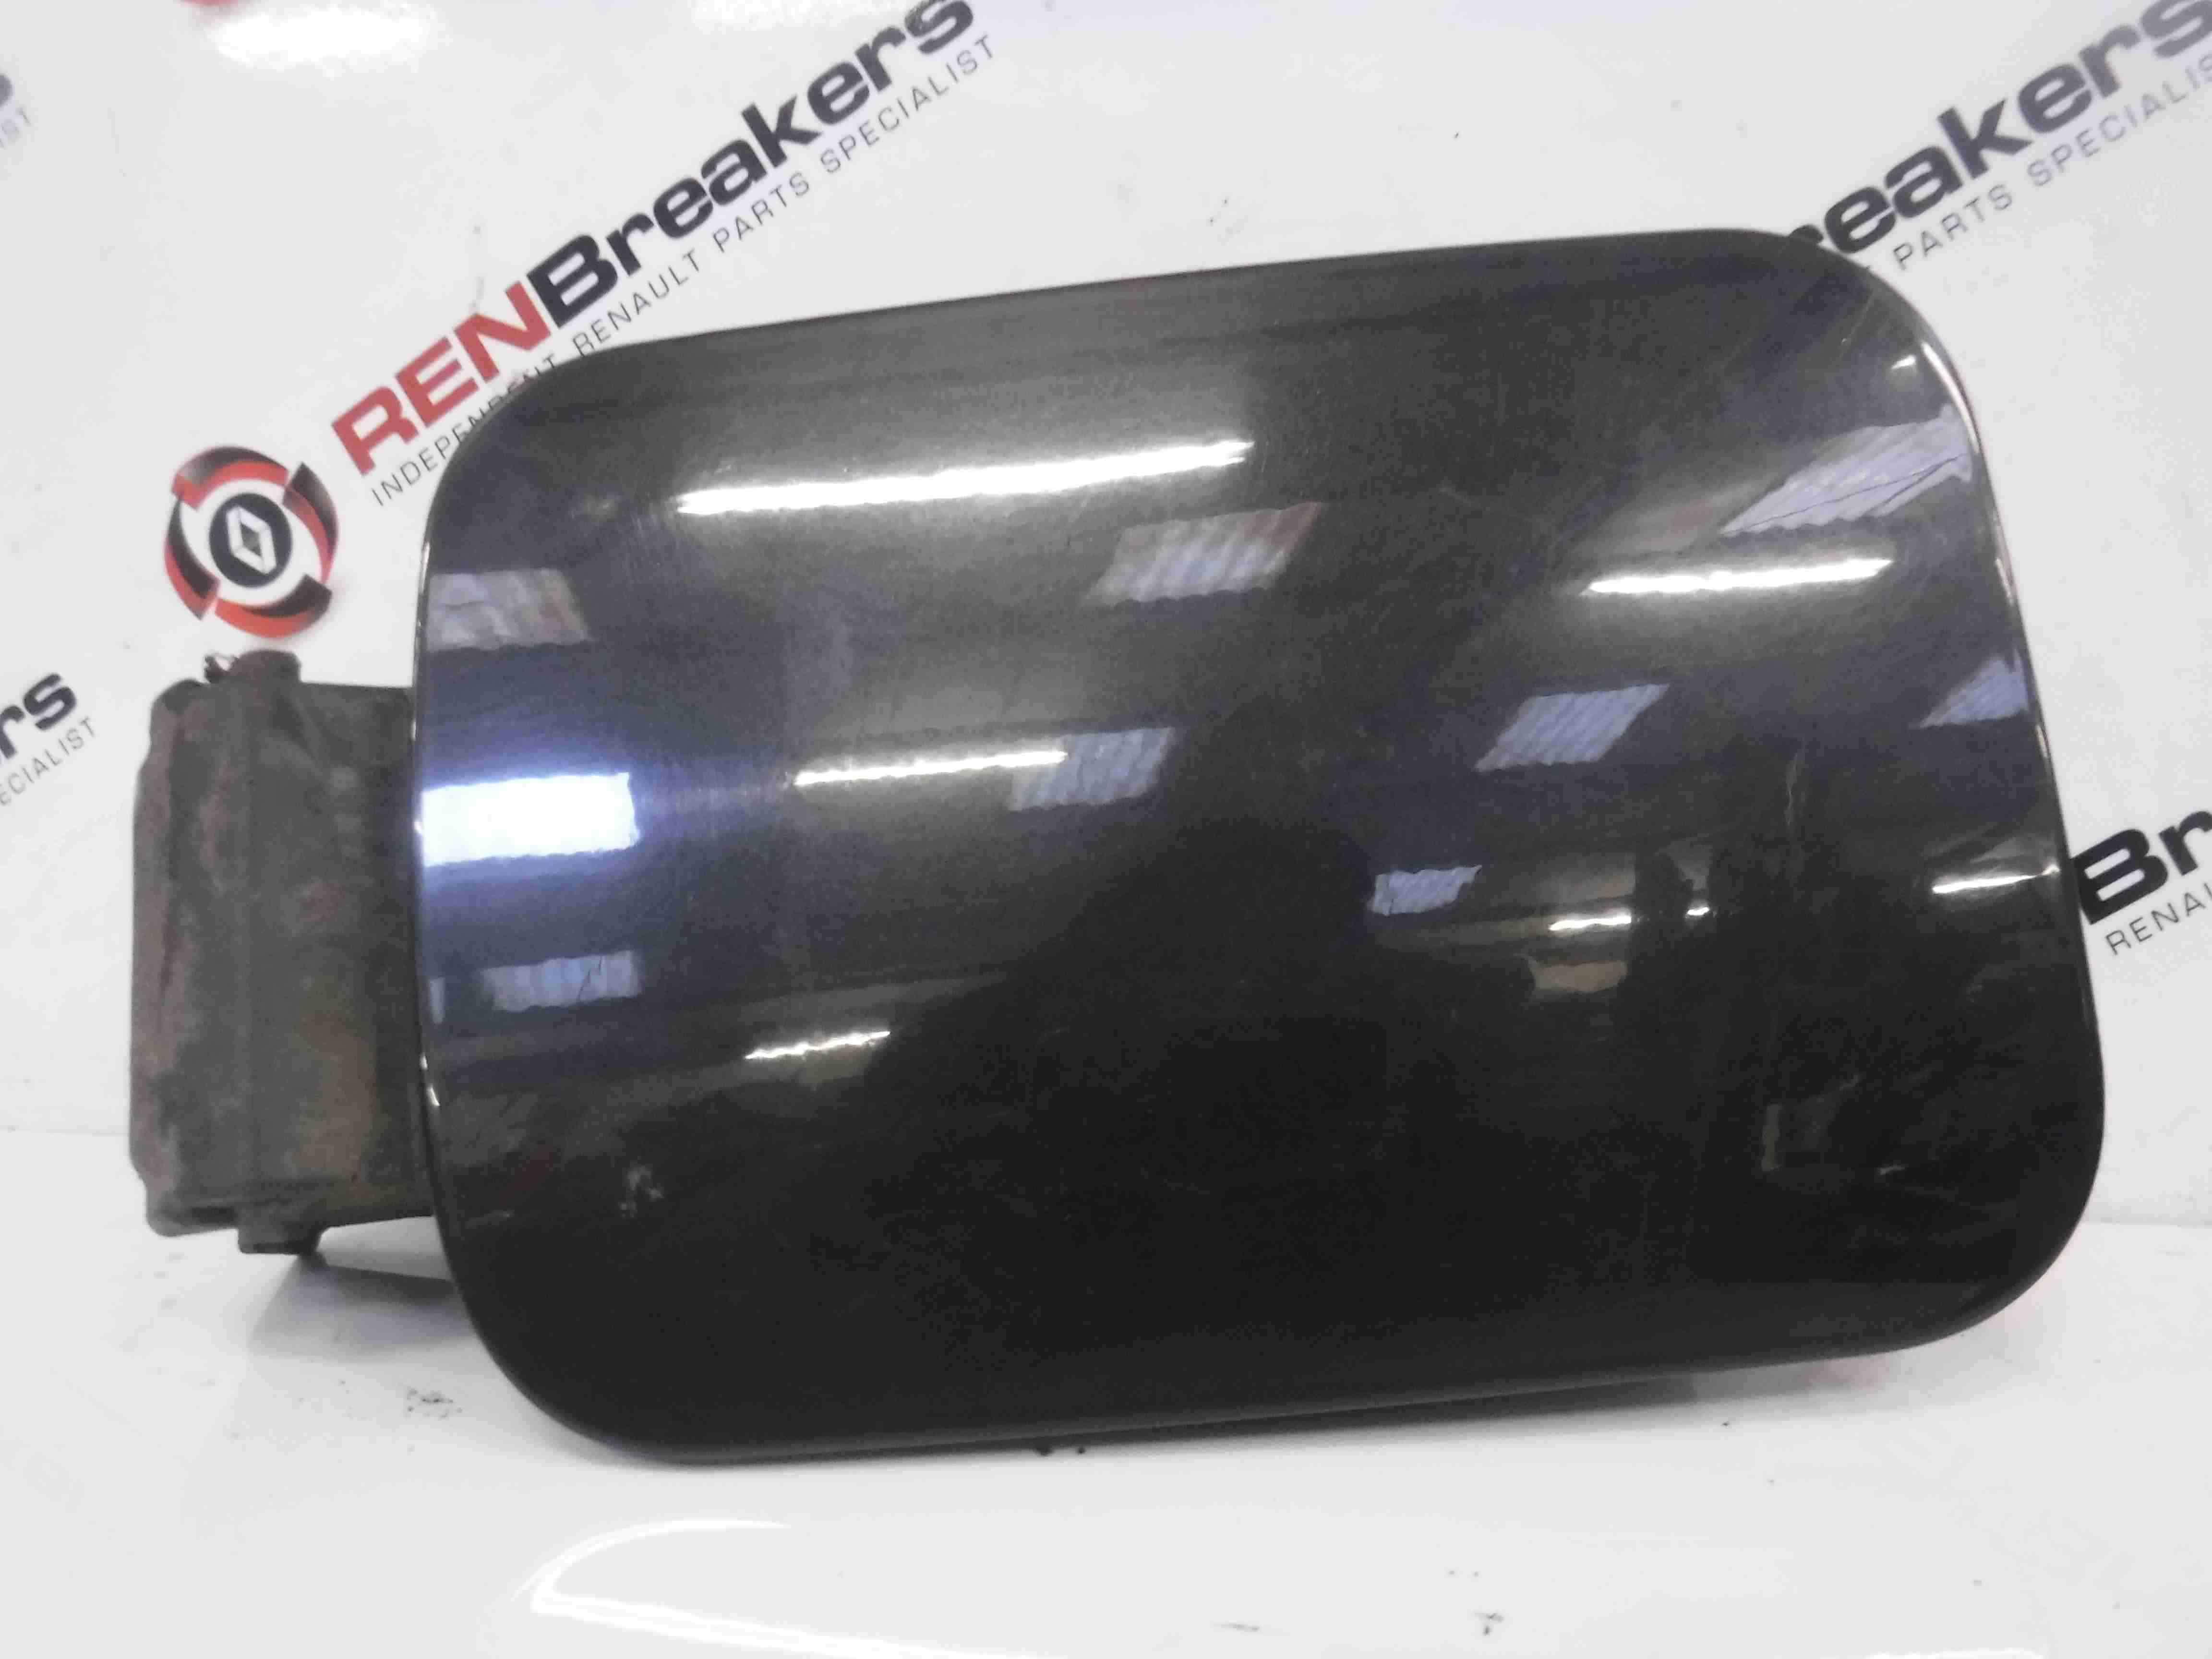 Renault Megane 2002-2008 Fuel Flap Cover Black 676 Hinges